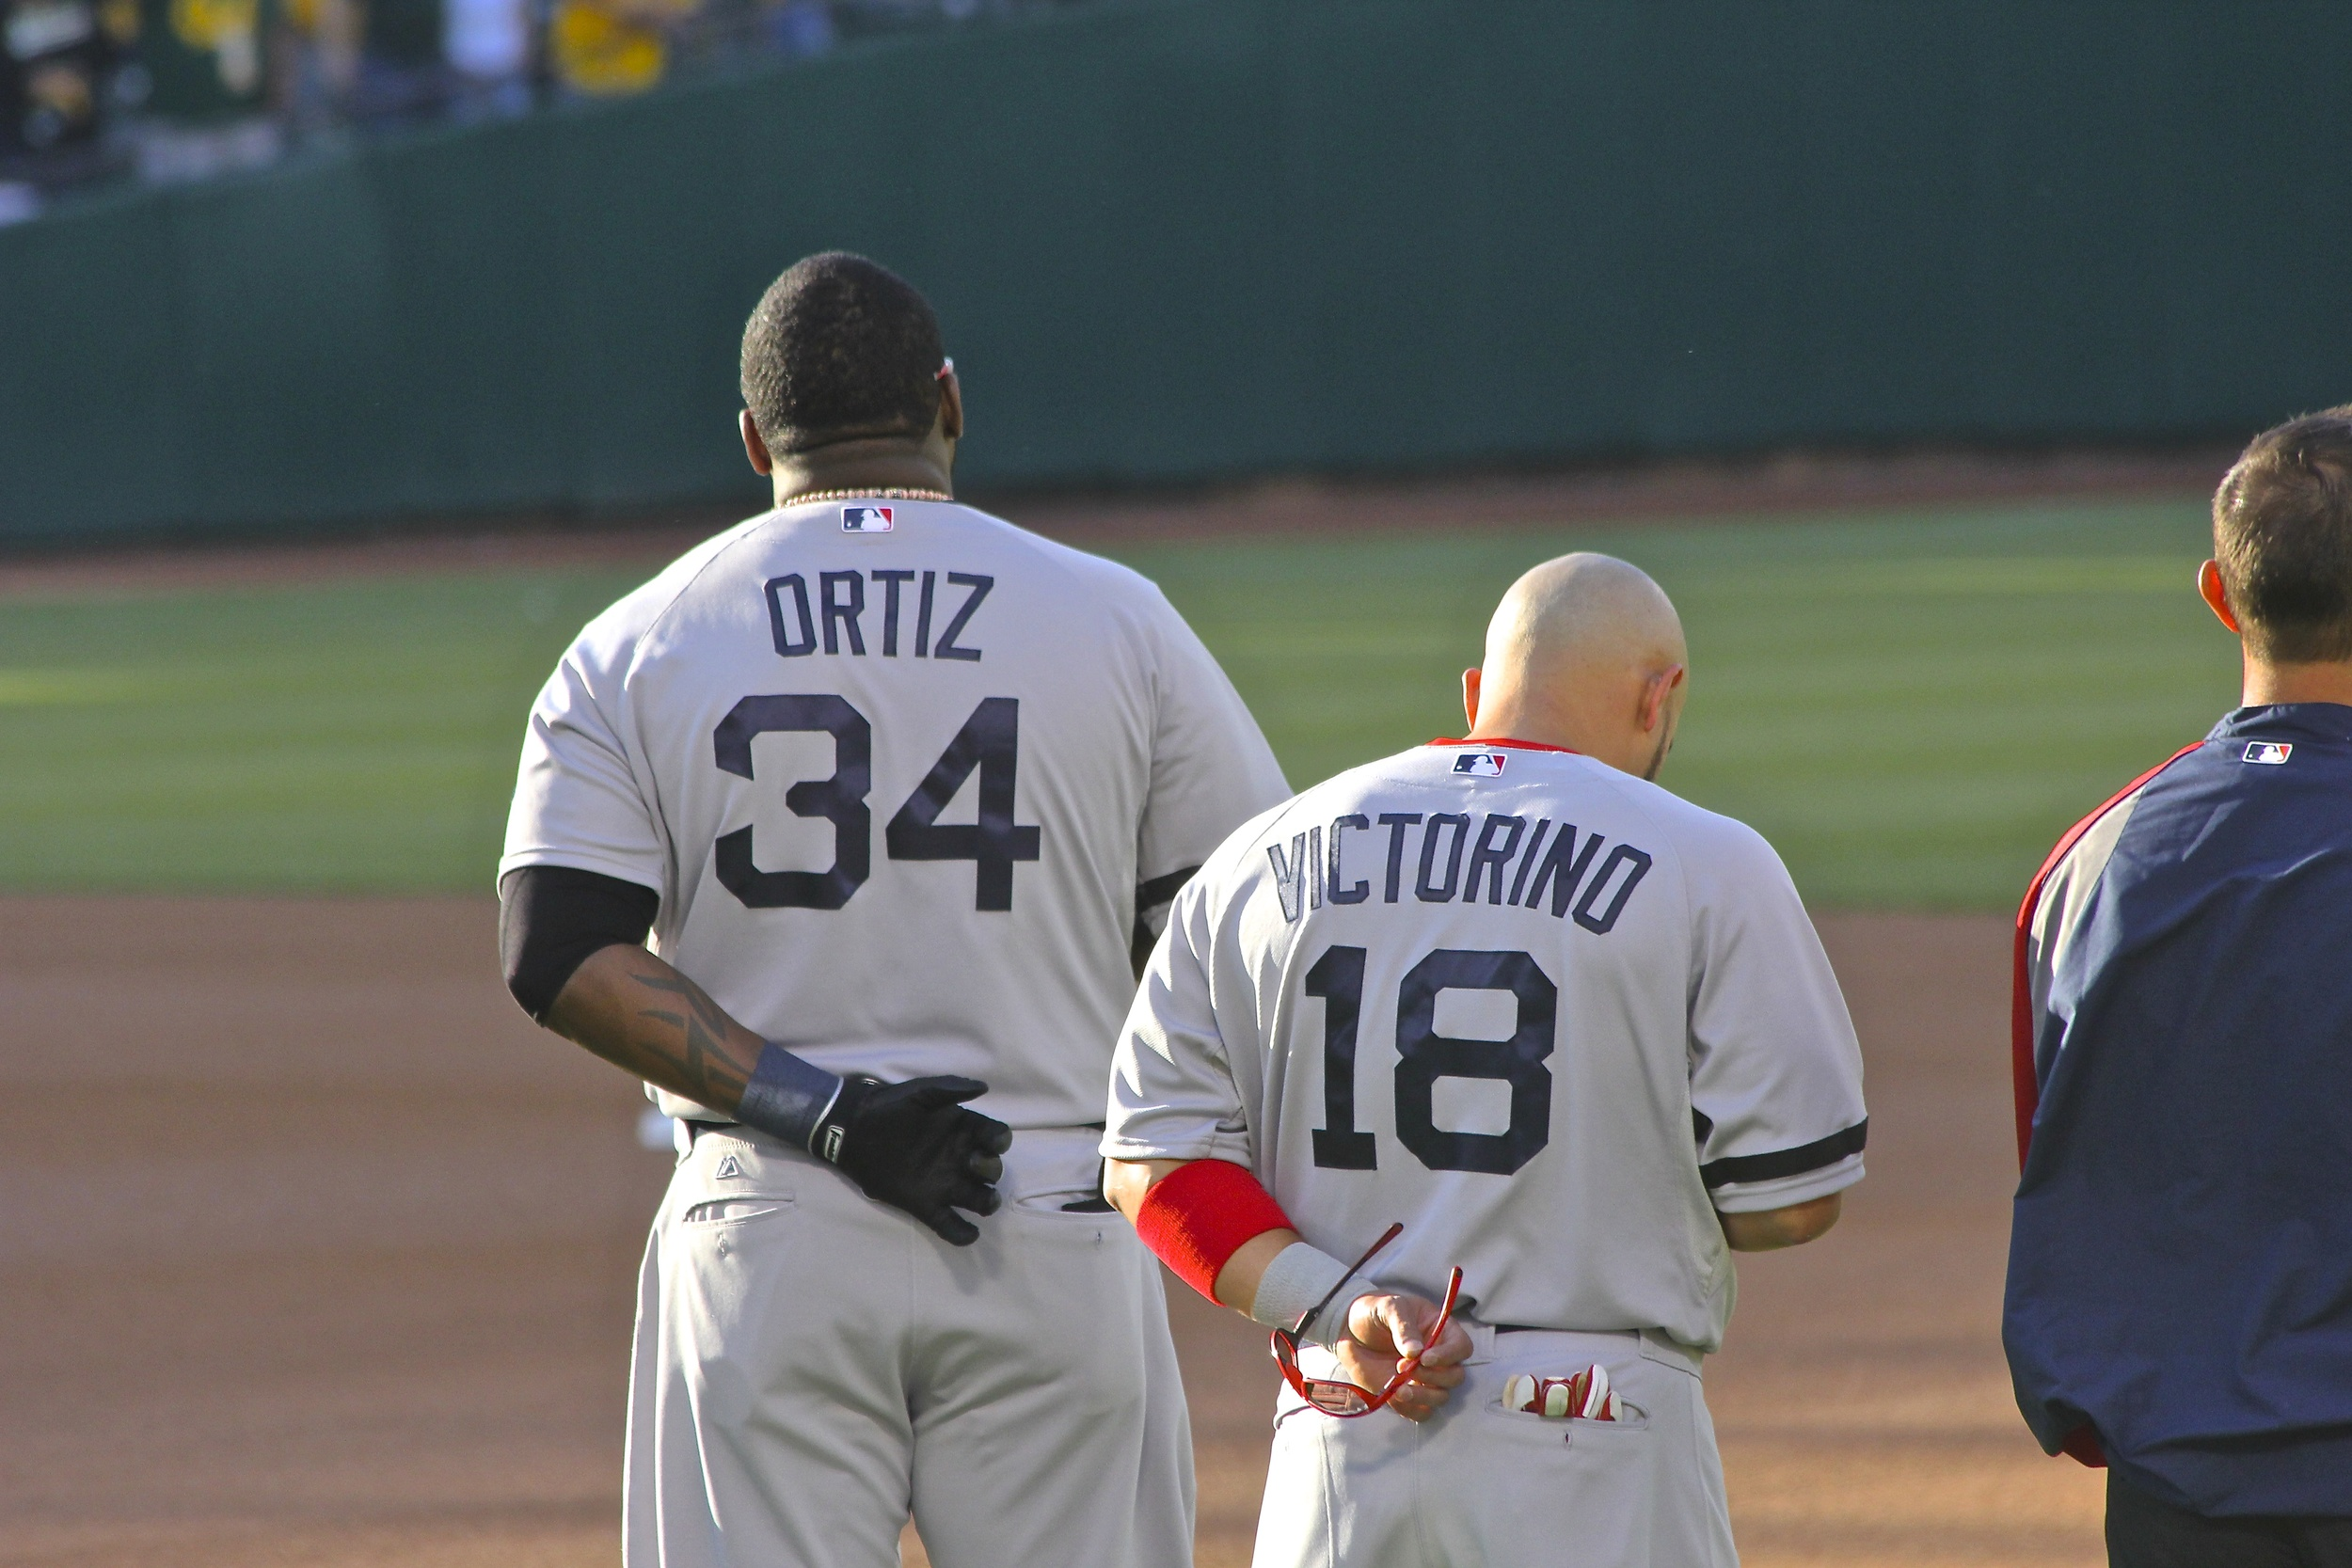 Ortiz and Victorino National Anthem